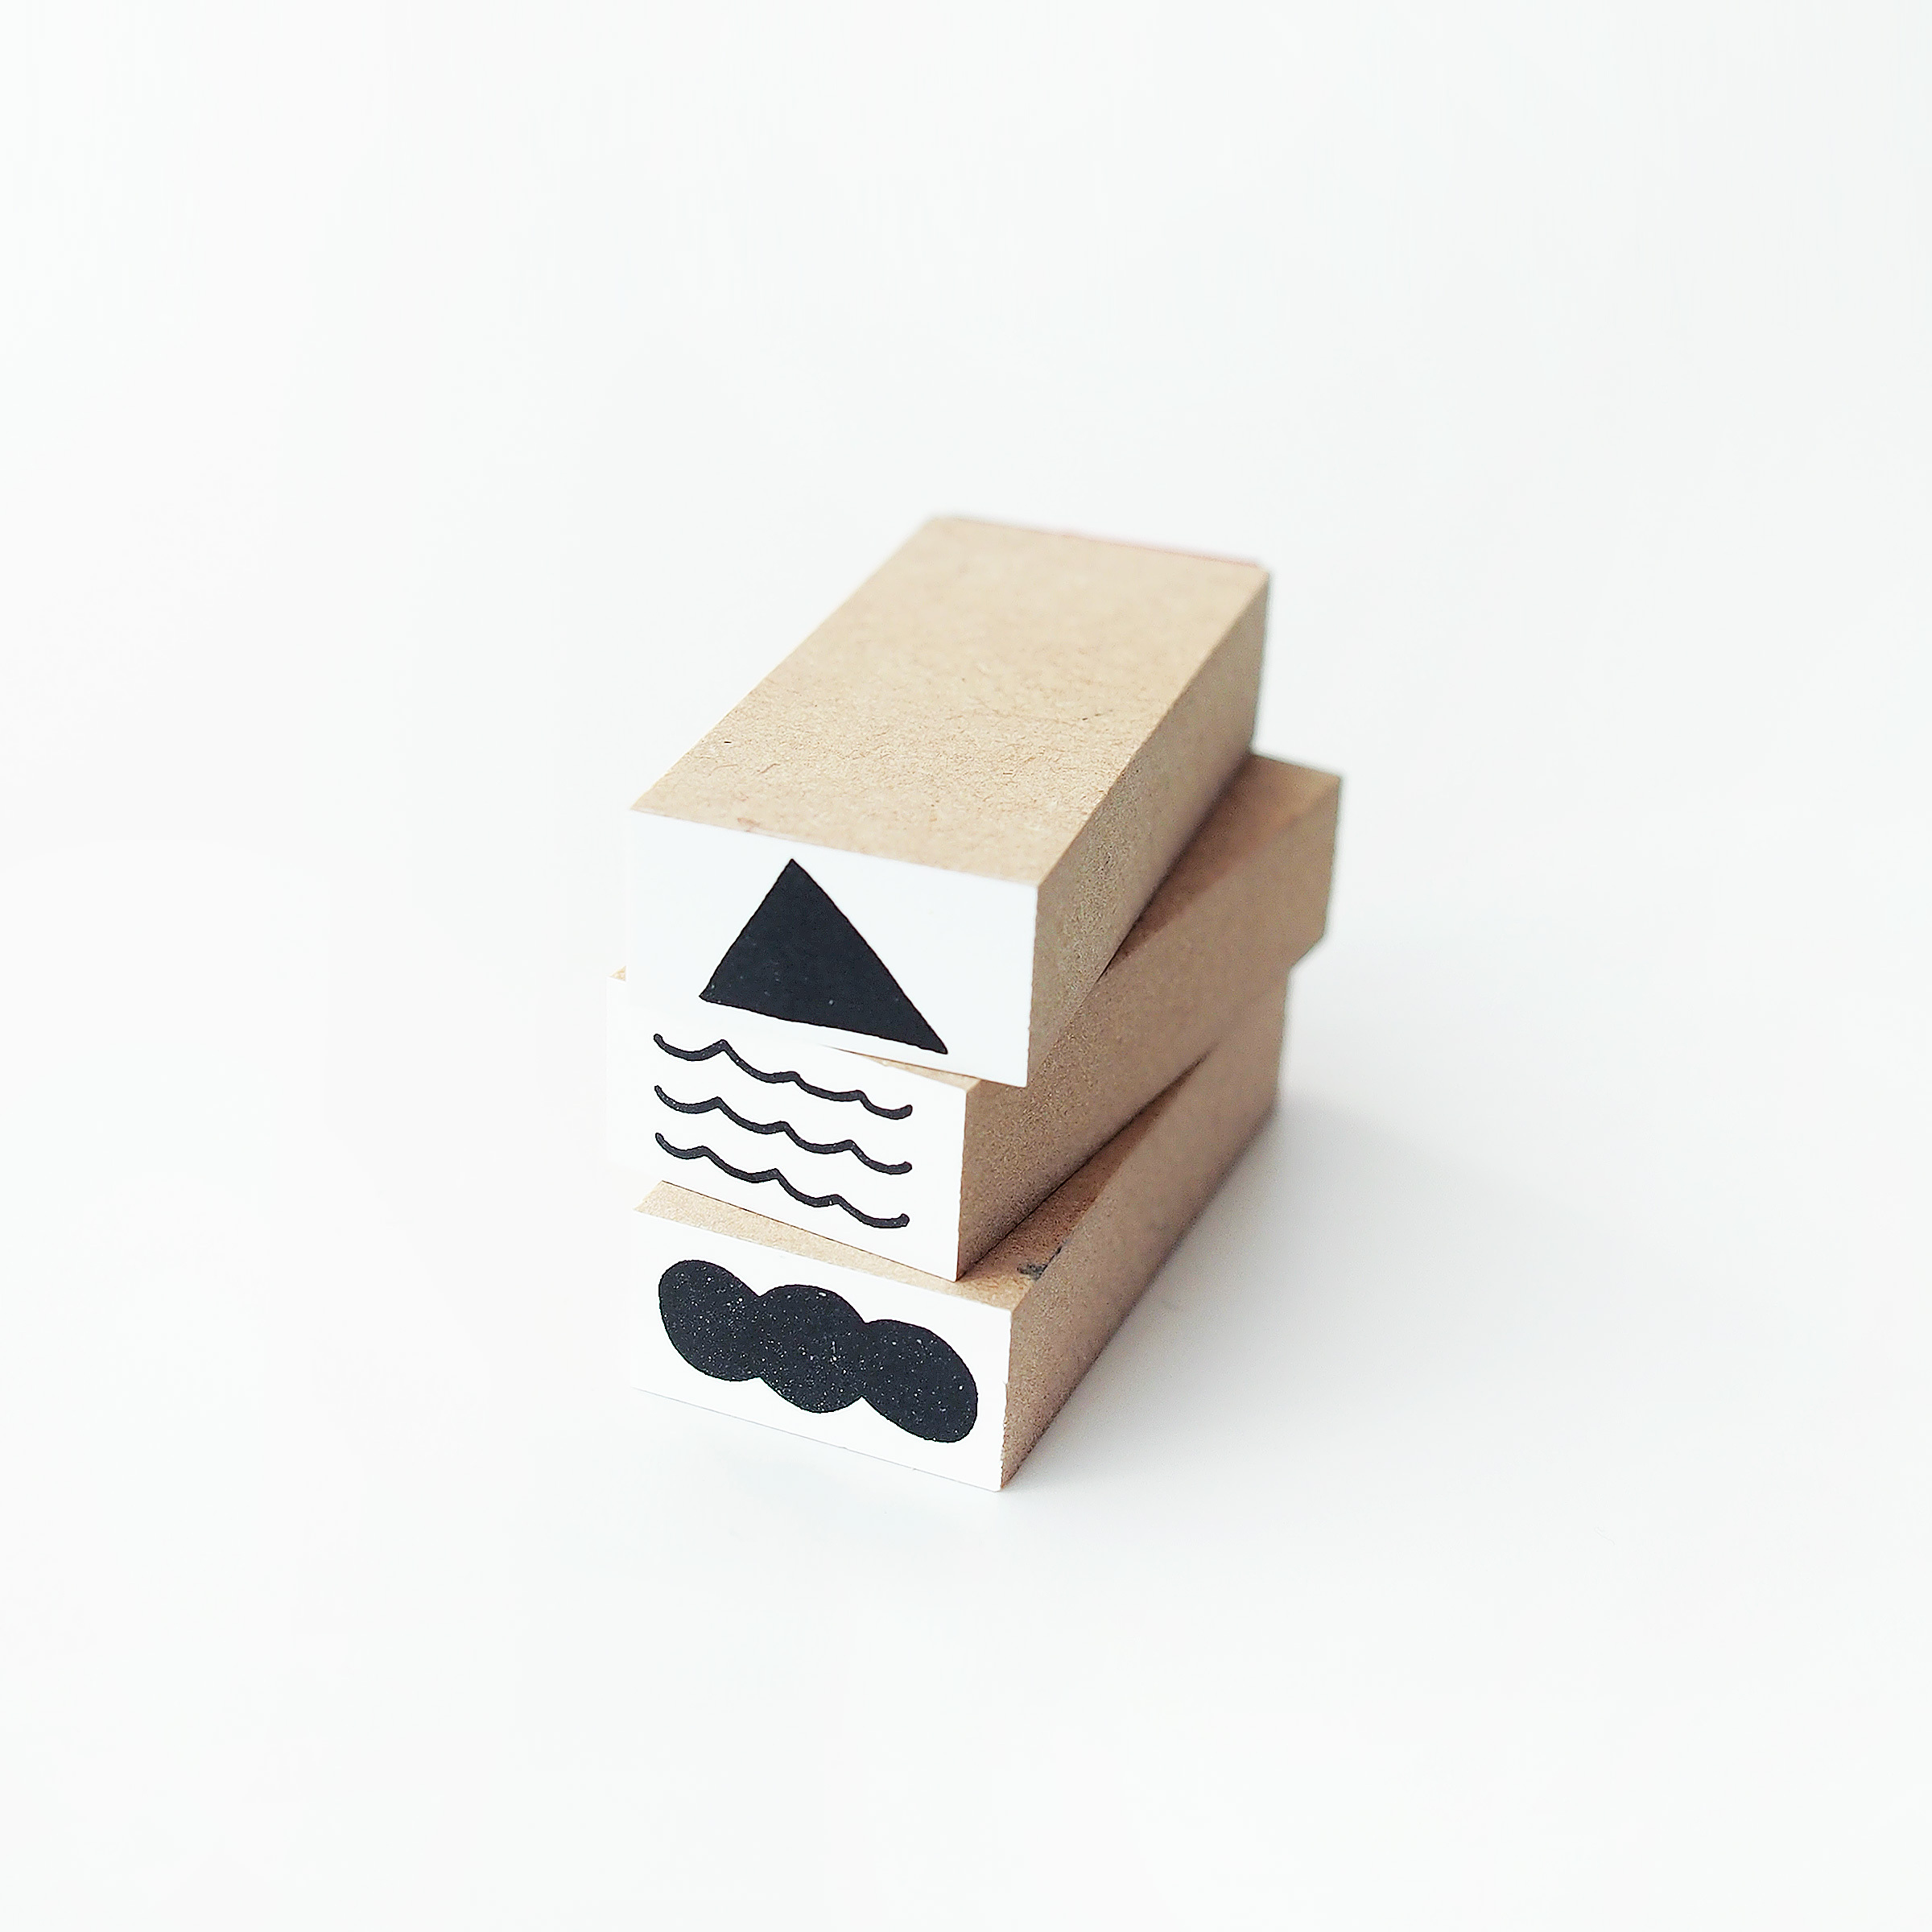 【S】POCONUR STAMP(ポコヌルスタンプ)|カタチ